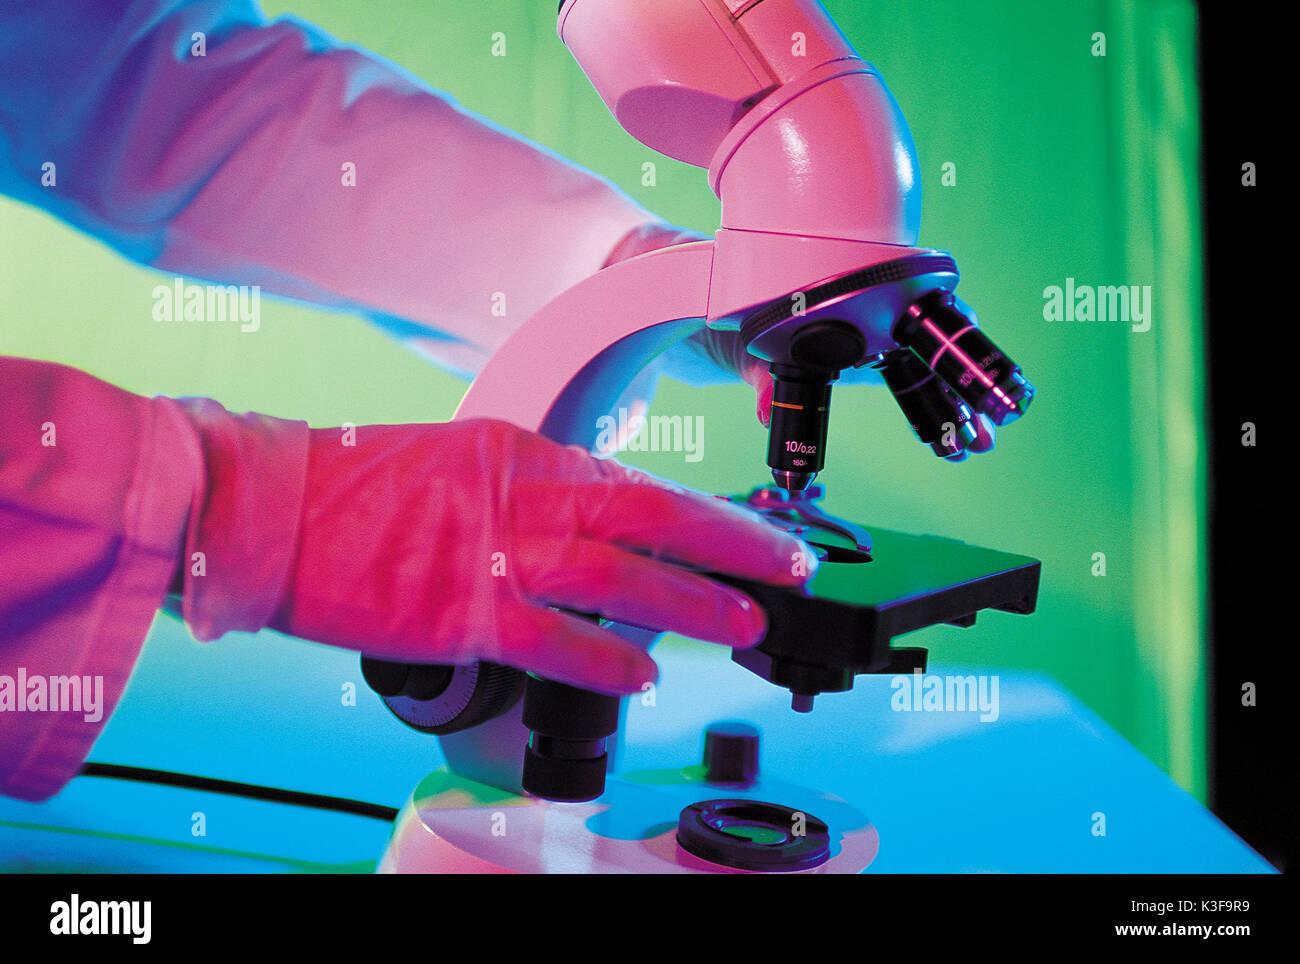 study under the microscope - Stock Image